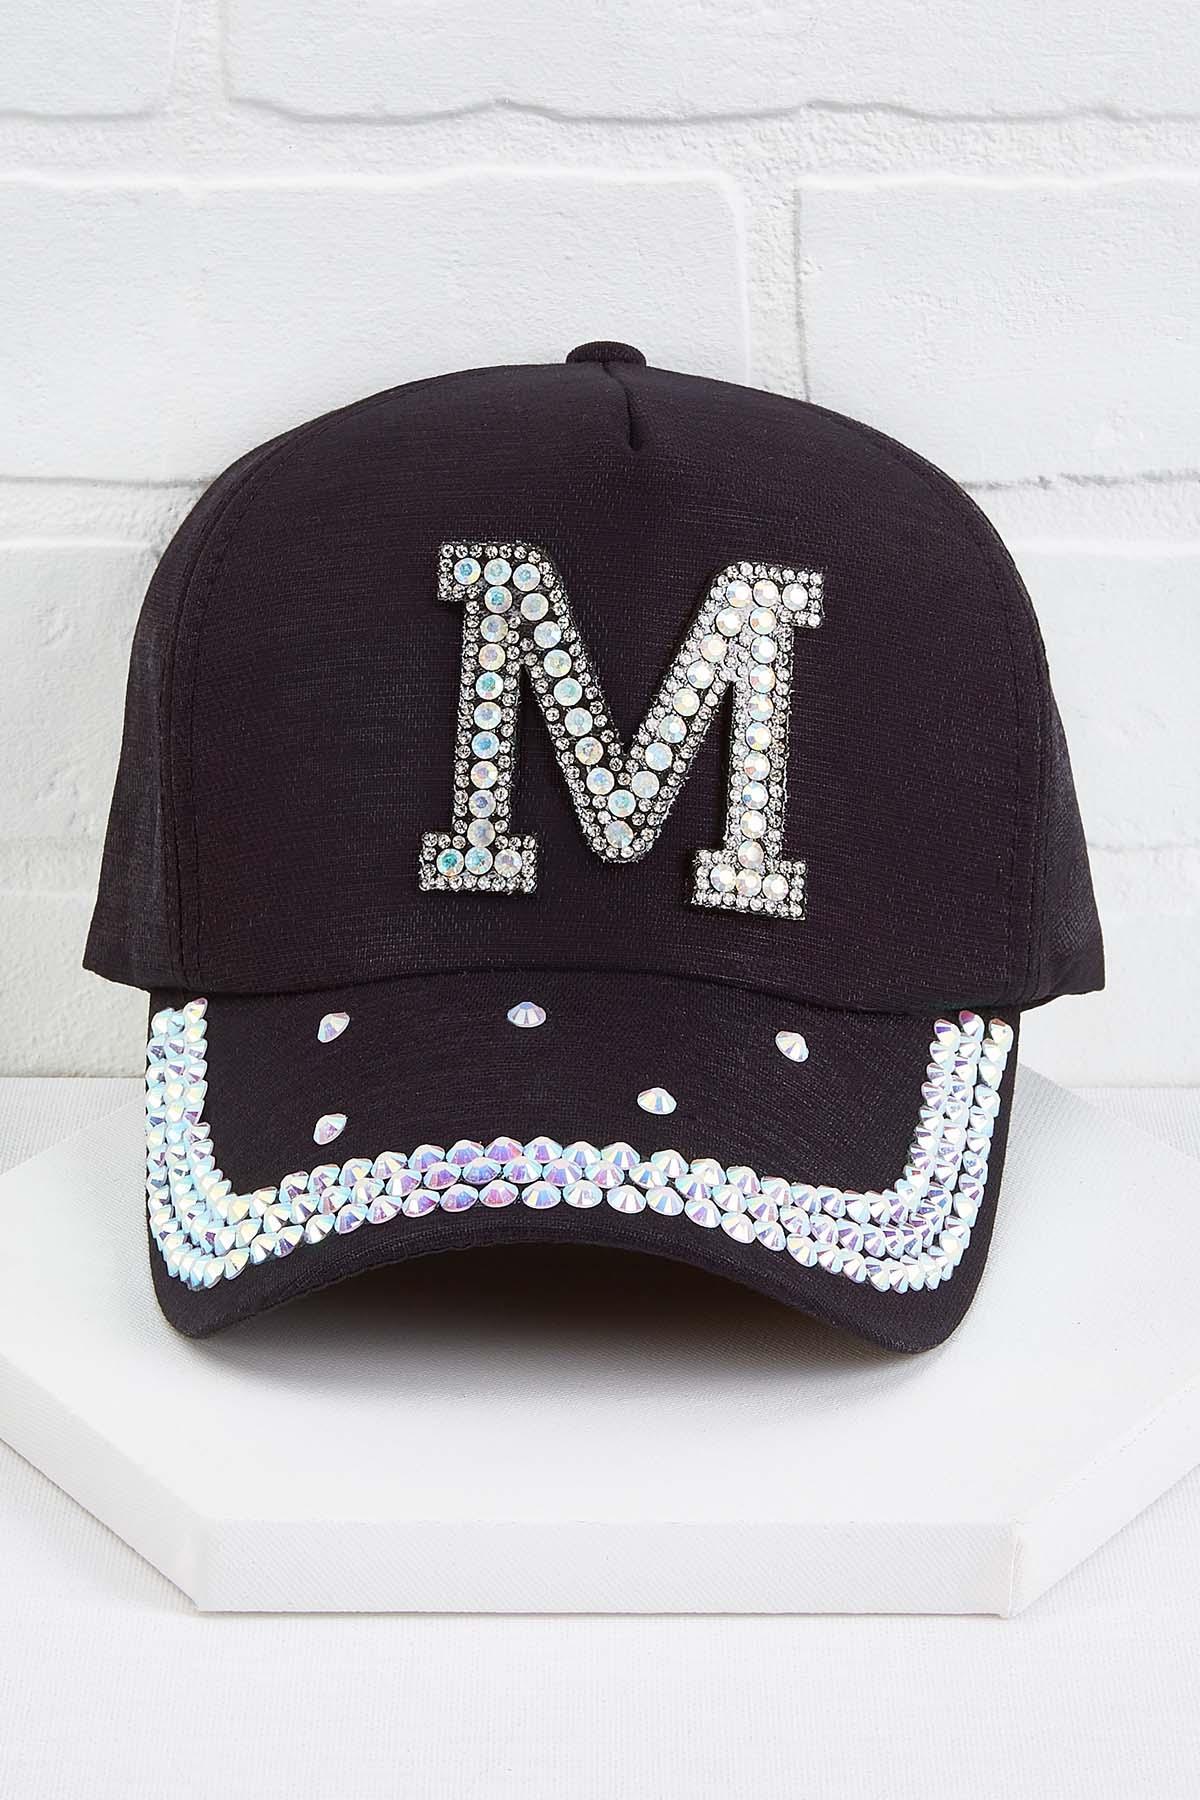 M Initial Bling Baseball Cap